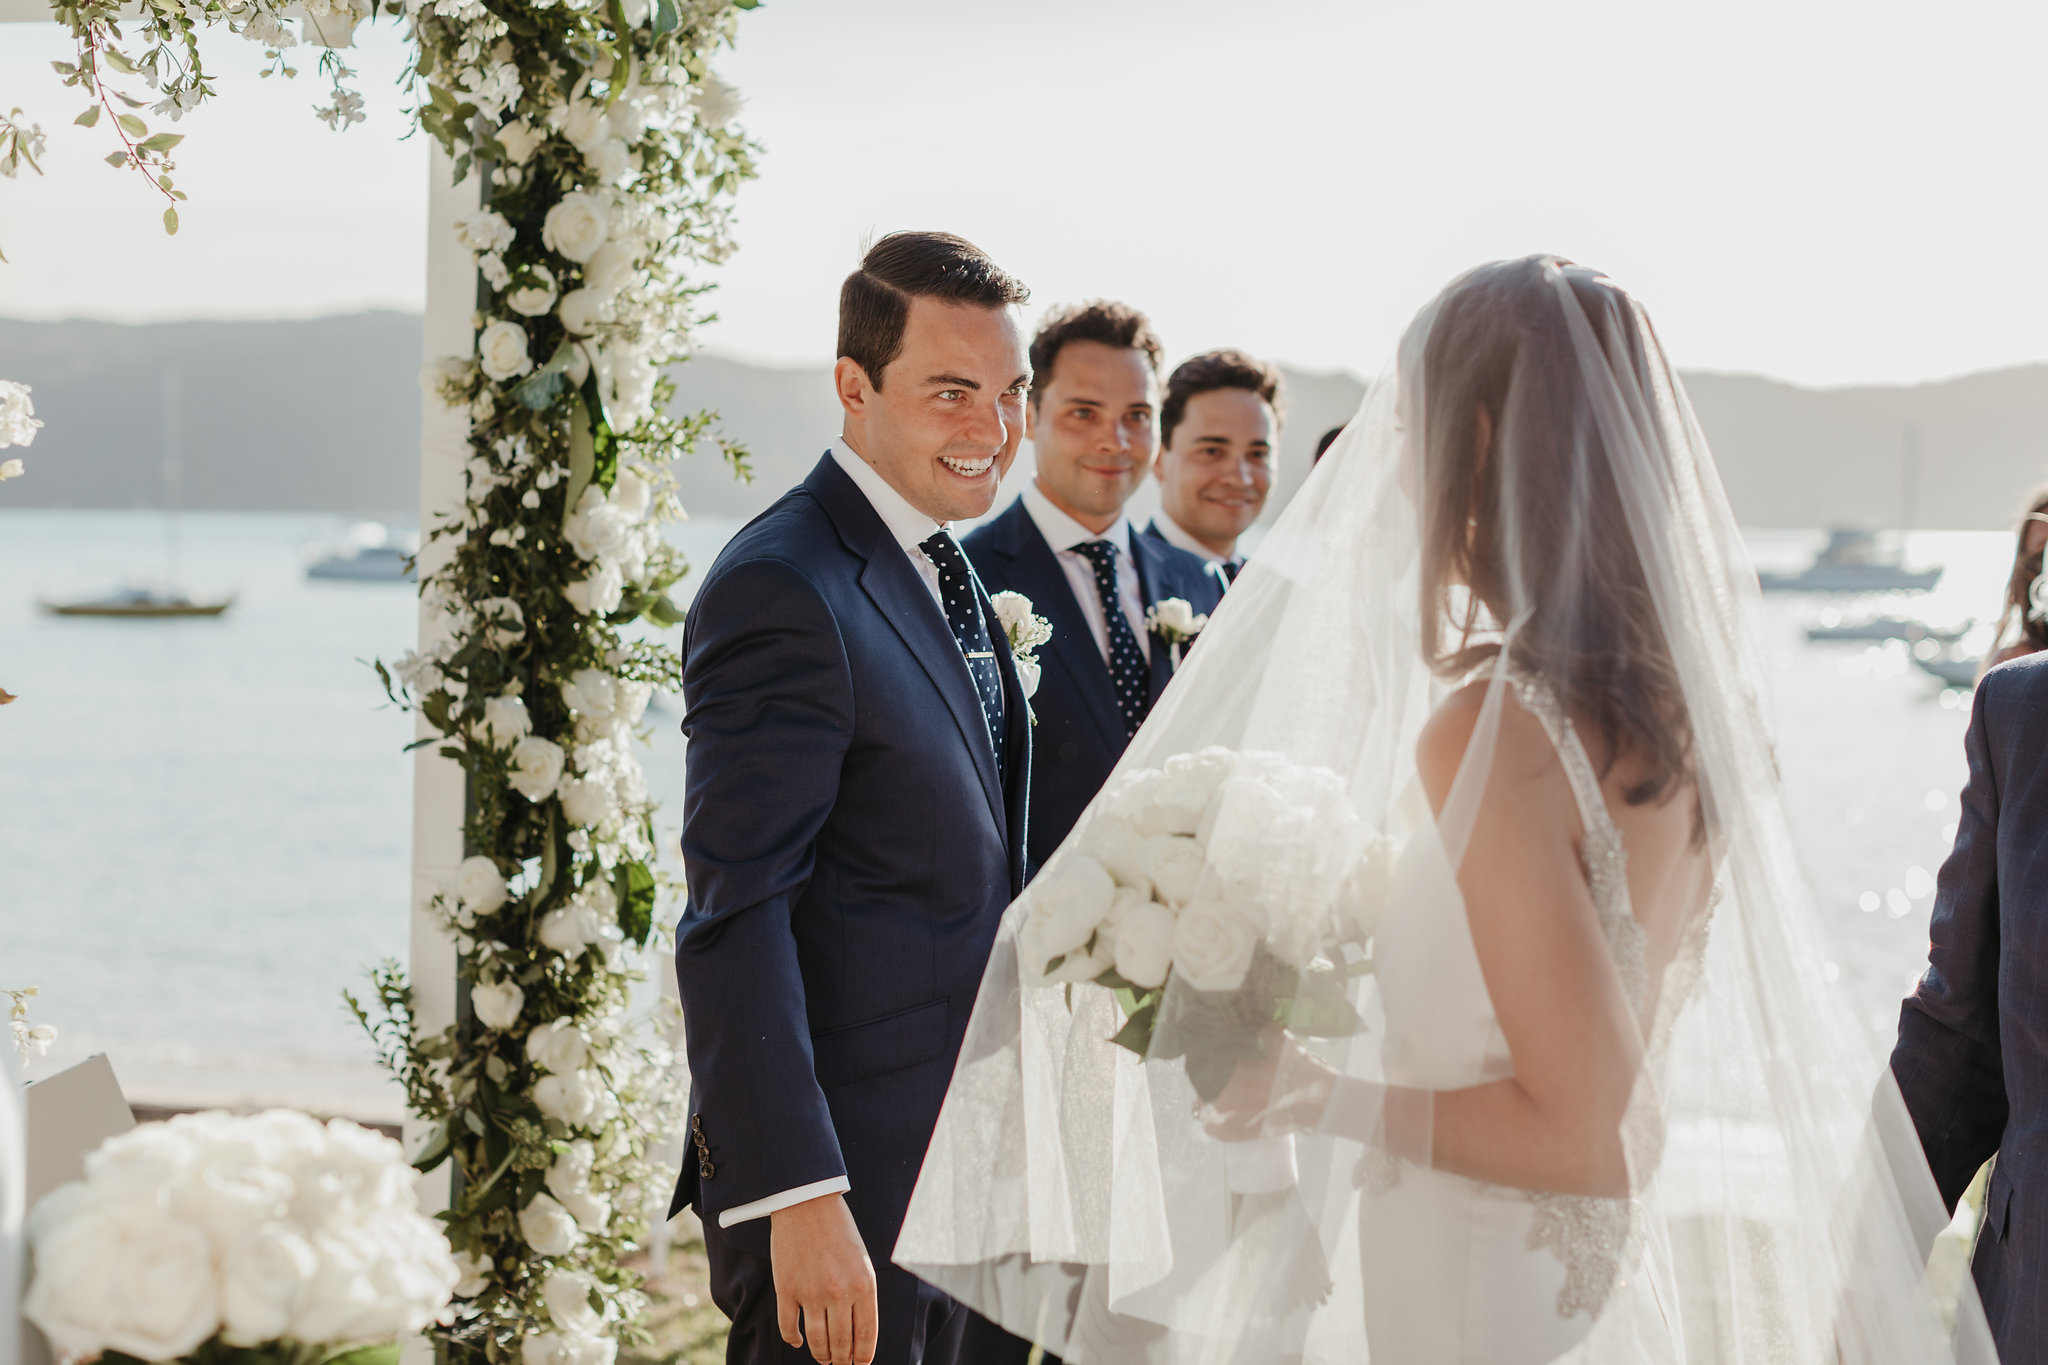 gen_chris_story_of_us_wedding-0249.JPG